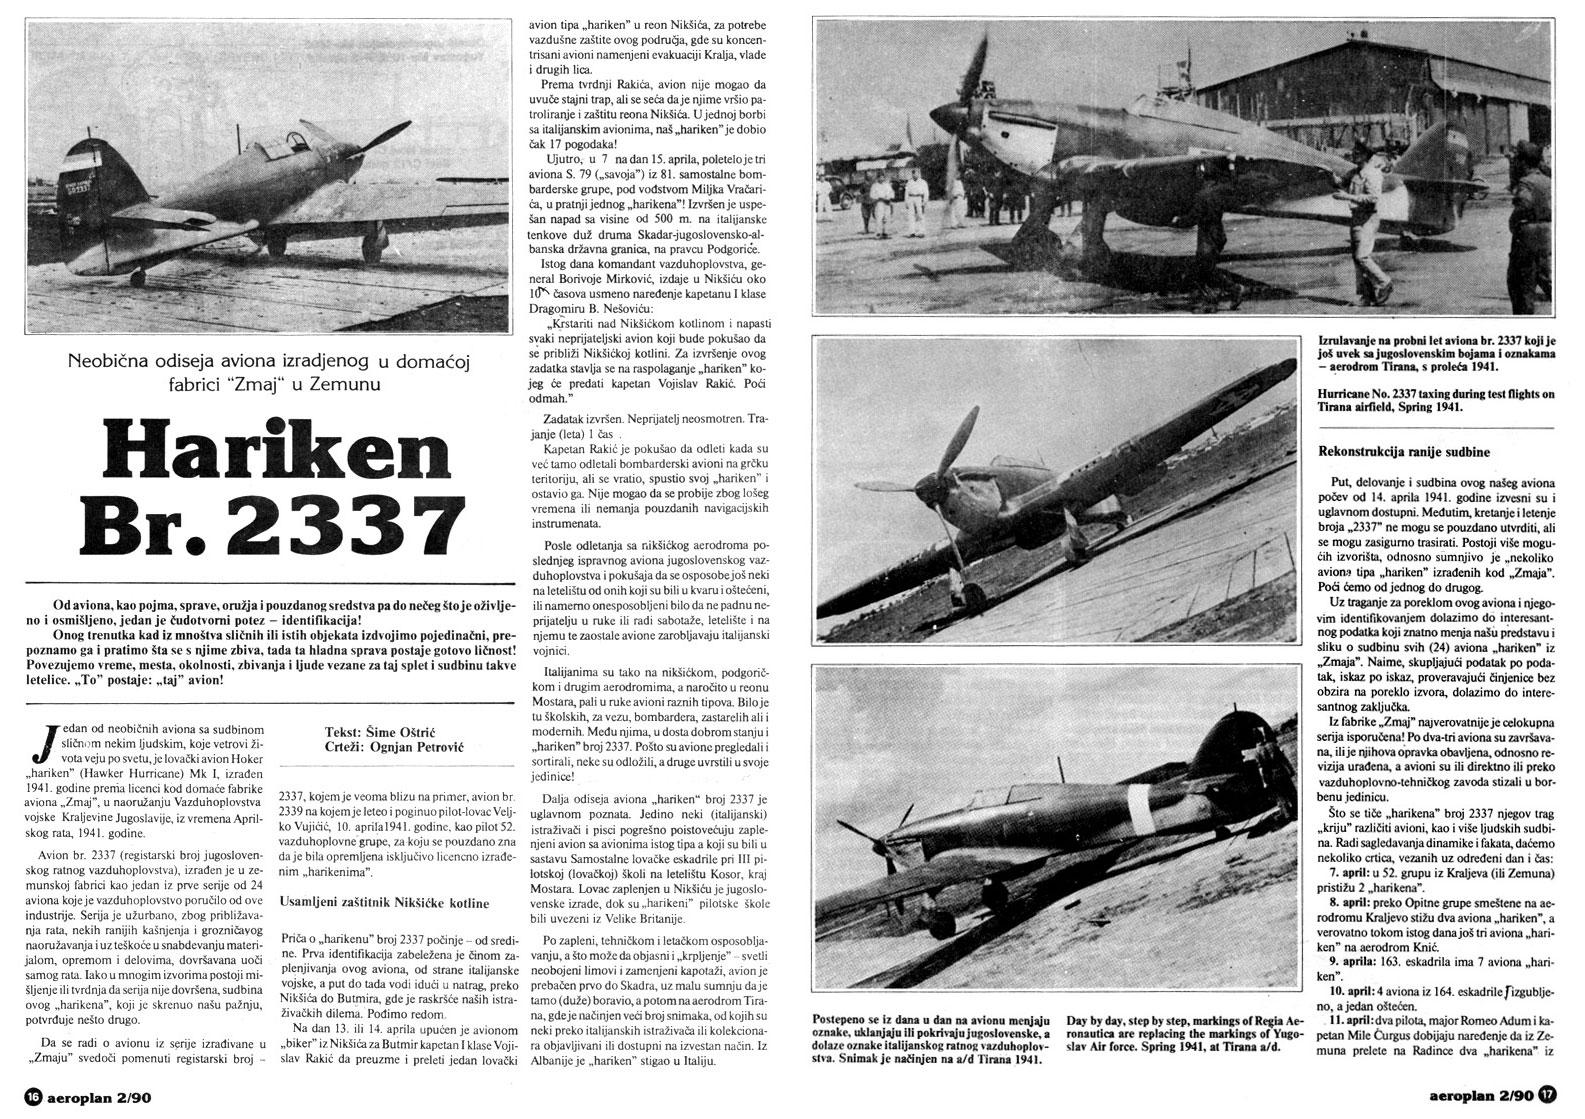 Hariken Br.2337 Yuvam Aeroplan Mar Apr 1990 01